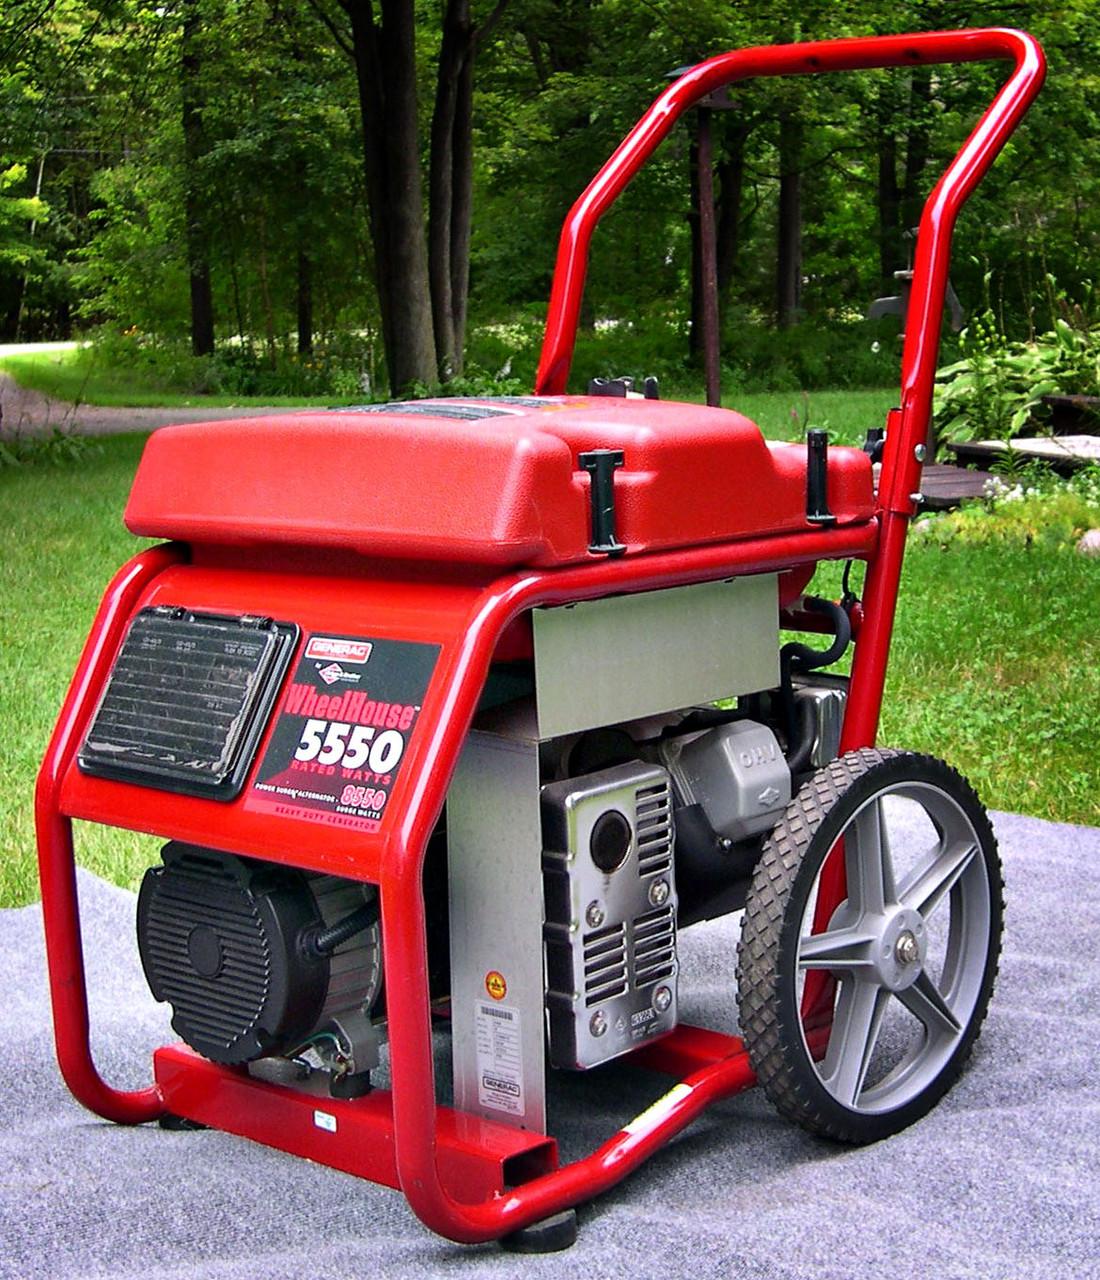 We offer generators if power is needed